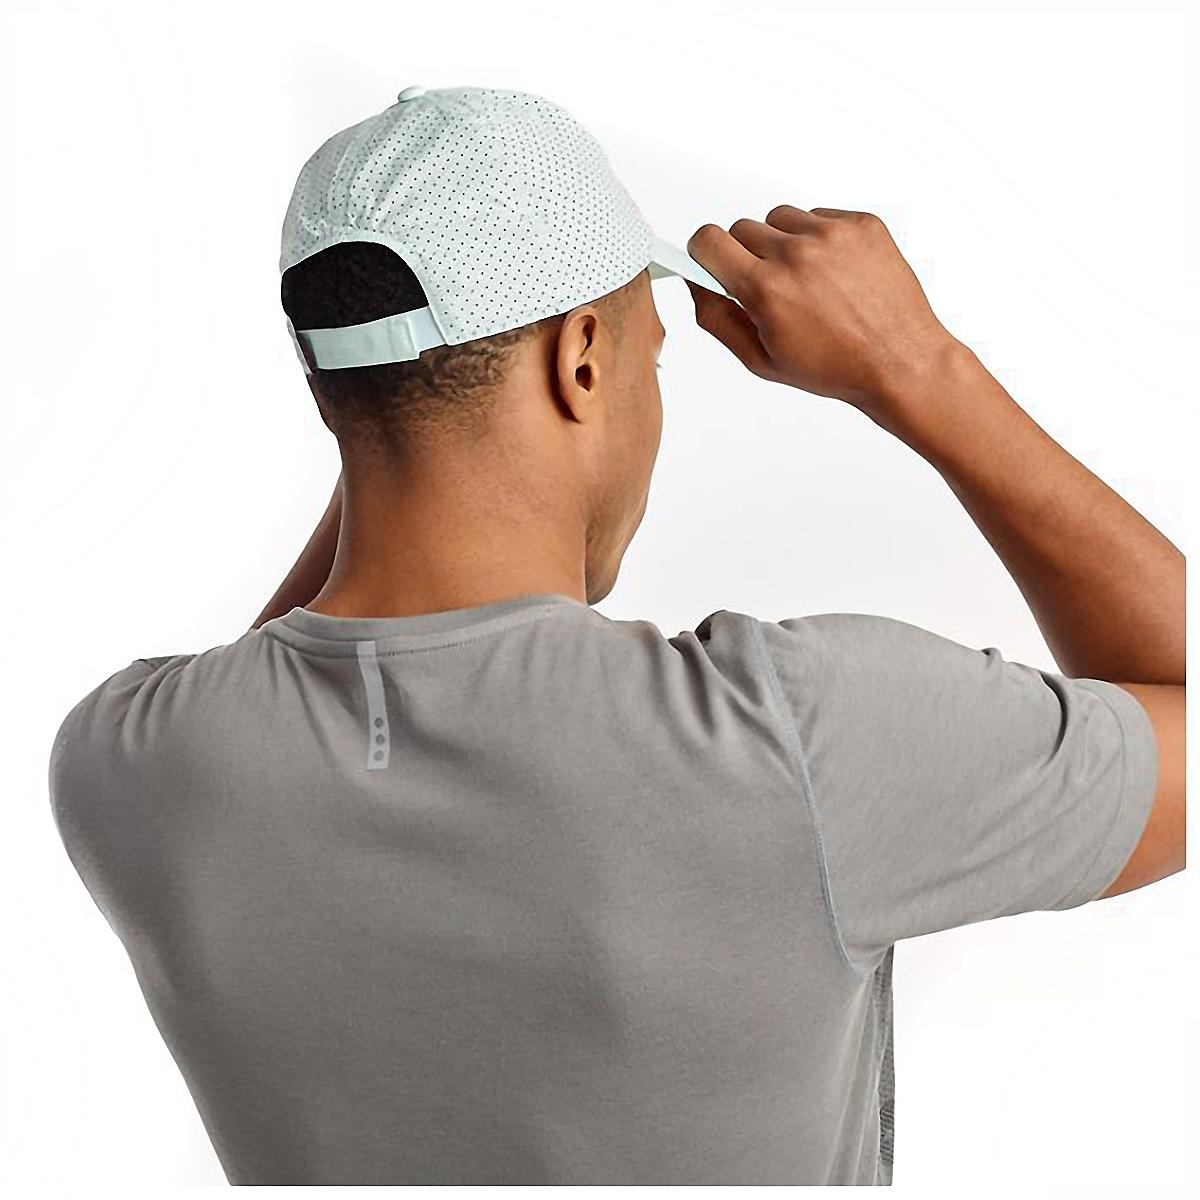 Saucony Doubleback Hat - Color: Opal Blue, Opal Blue, large, image 4